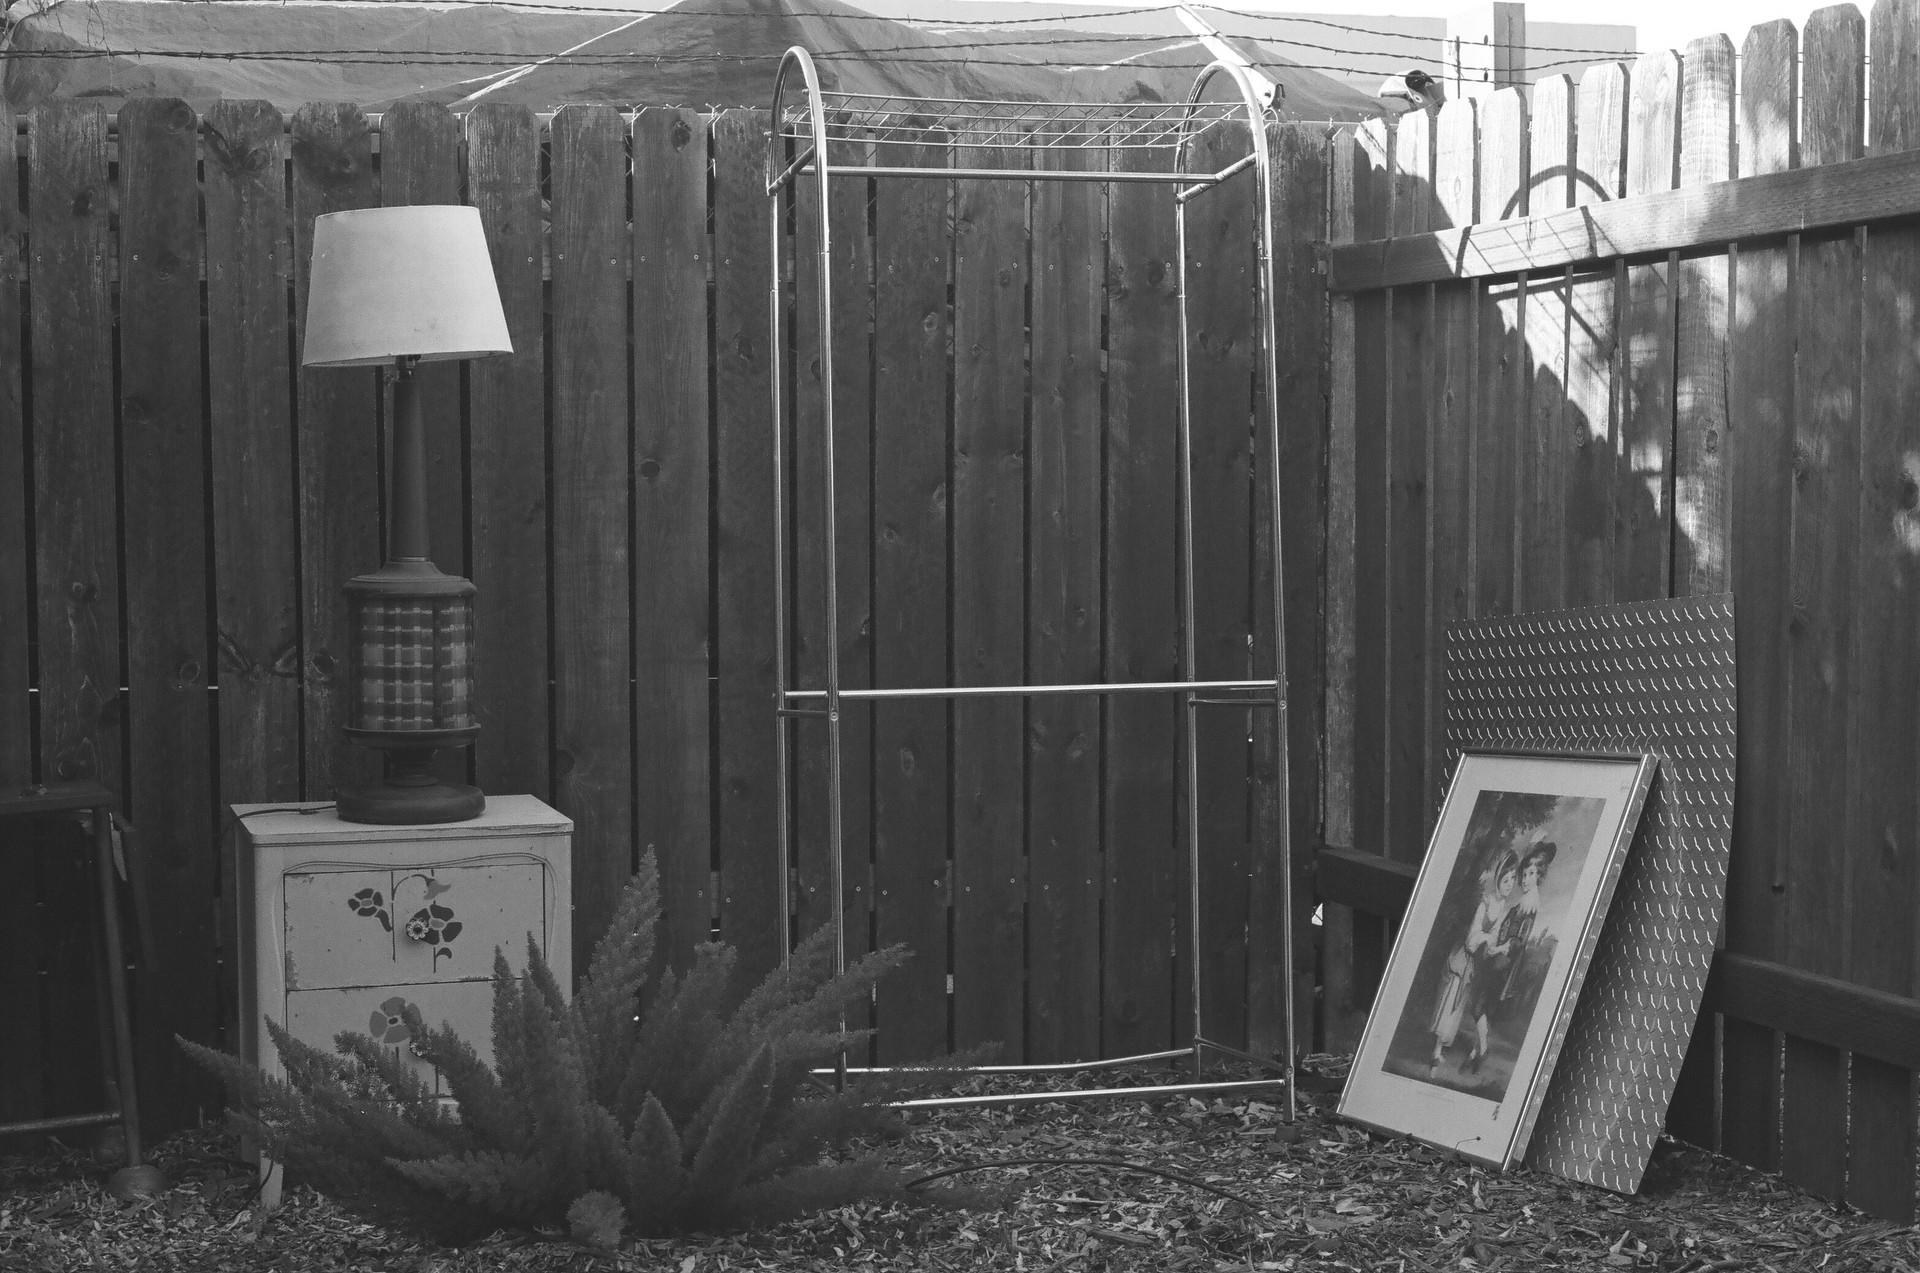 Princess Gollum's backyard